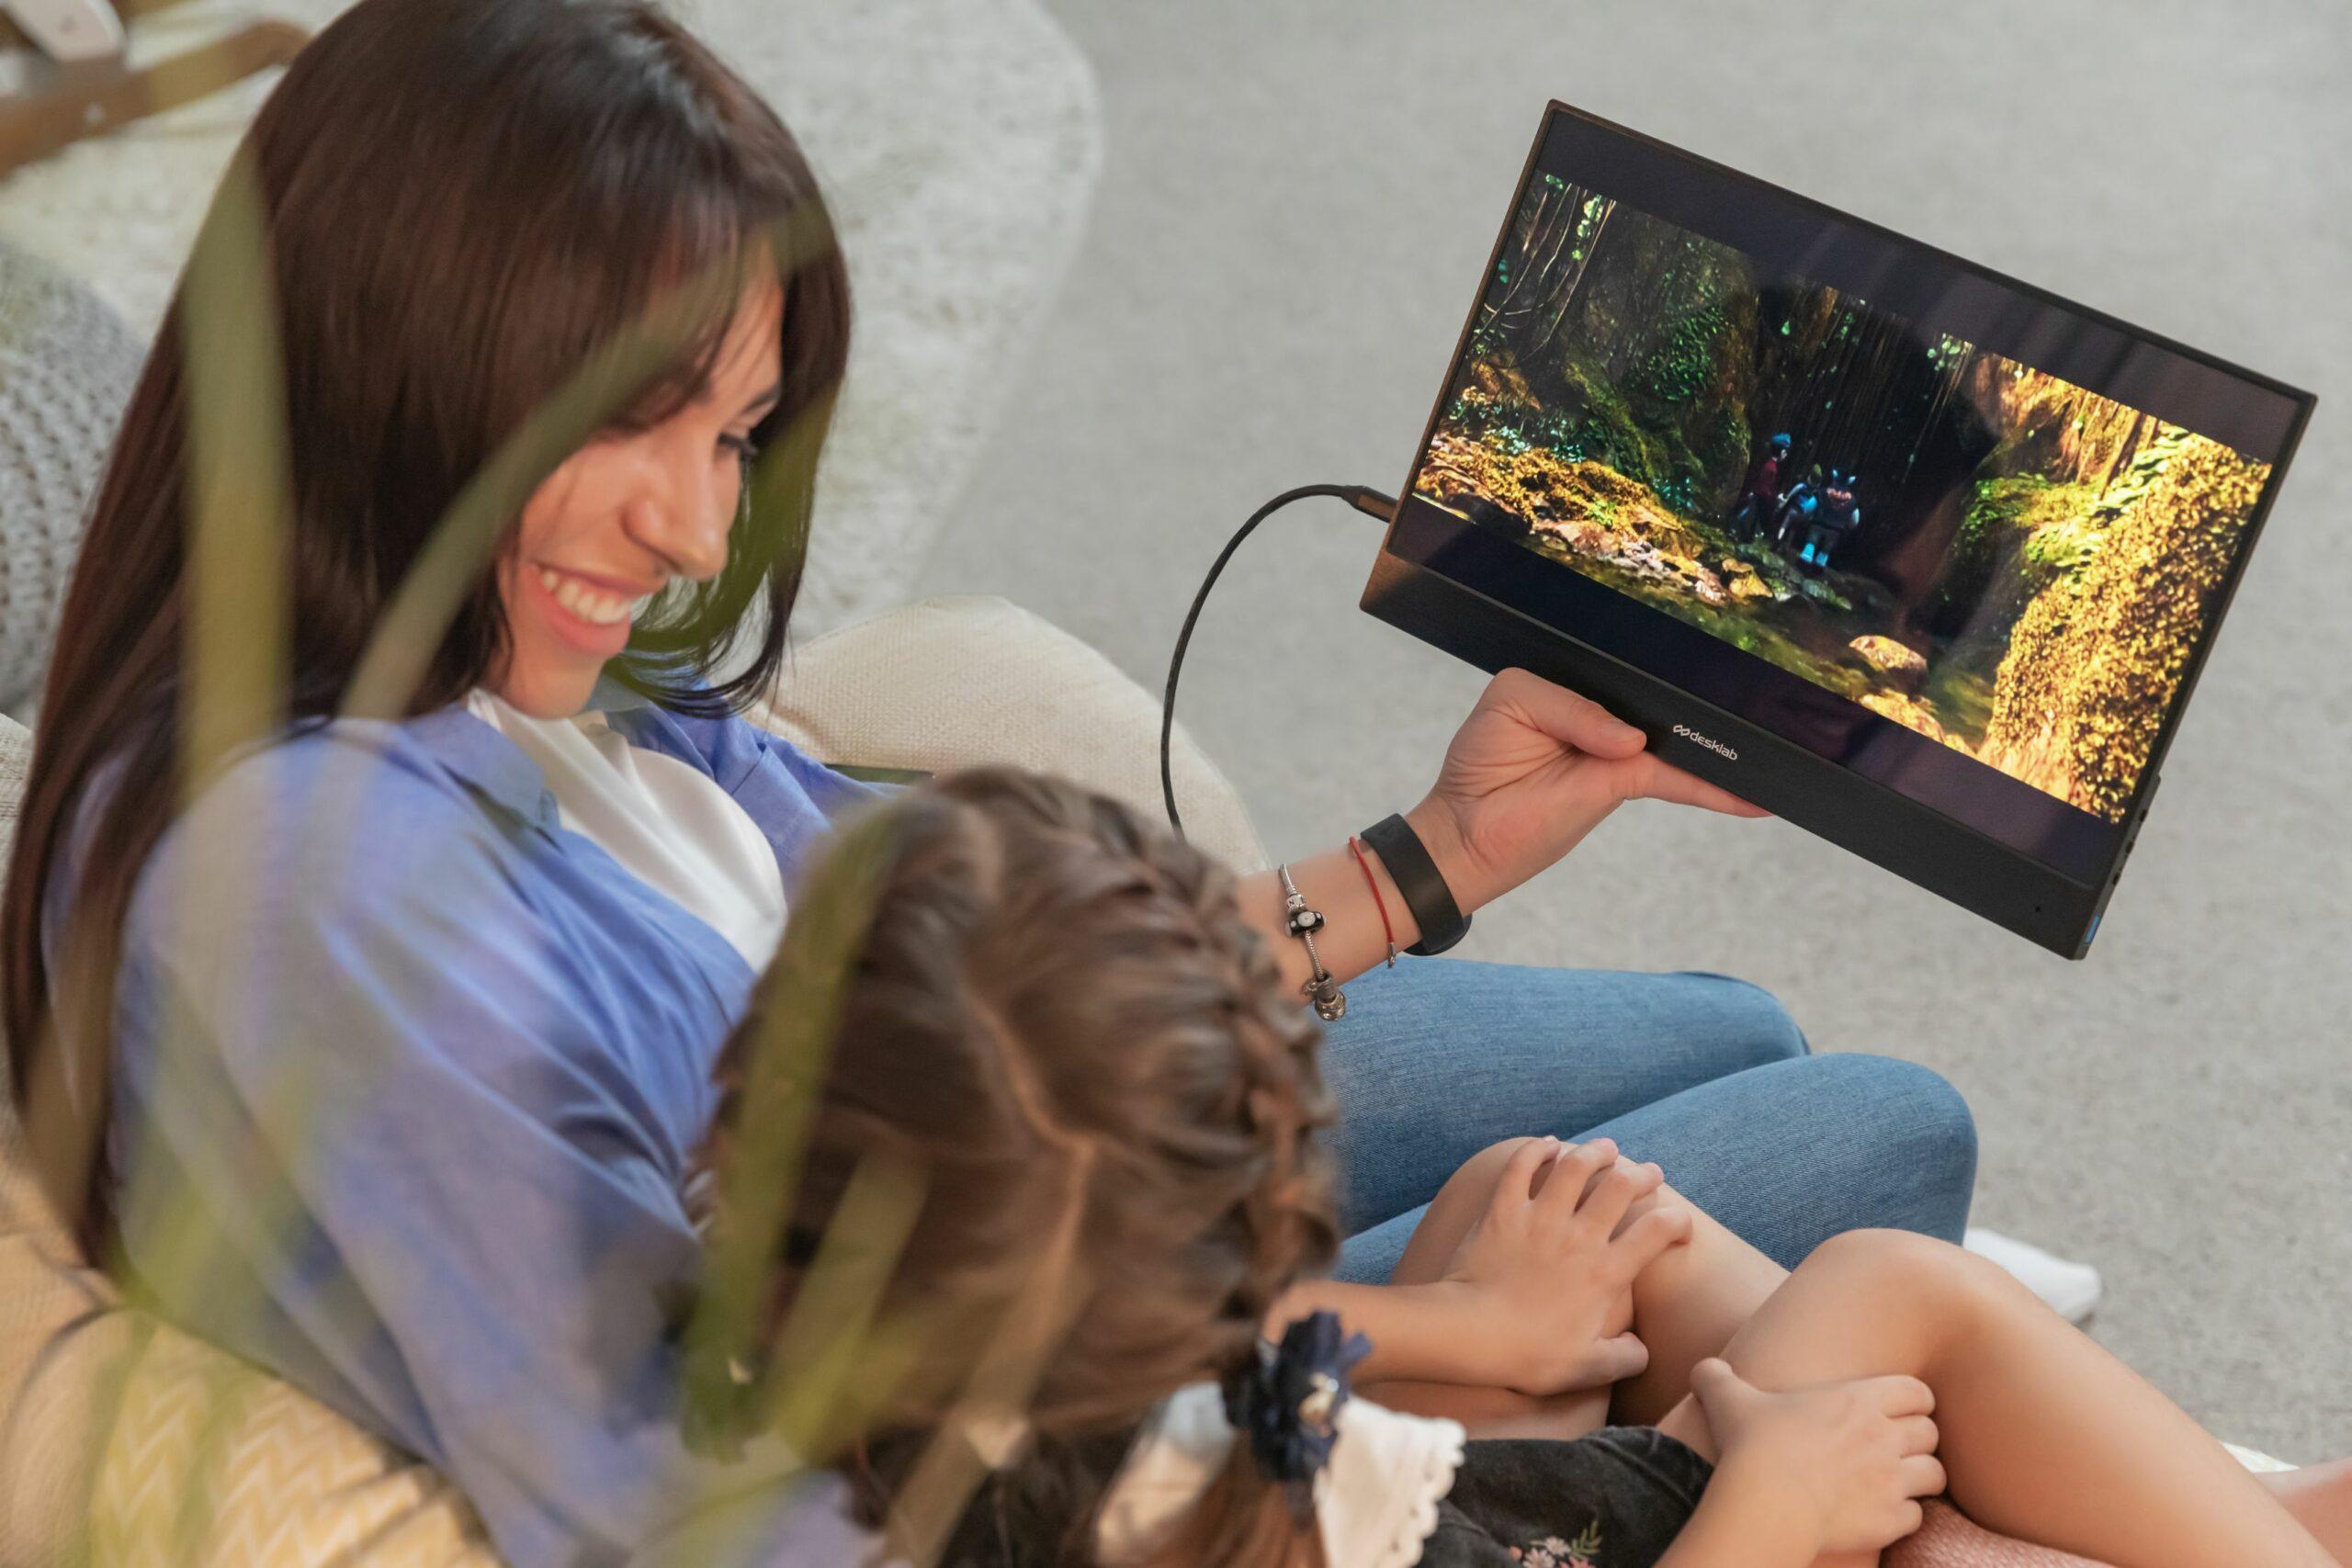 Desklab 4K 超輕便攜式觸摸屏顯示器